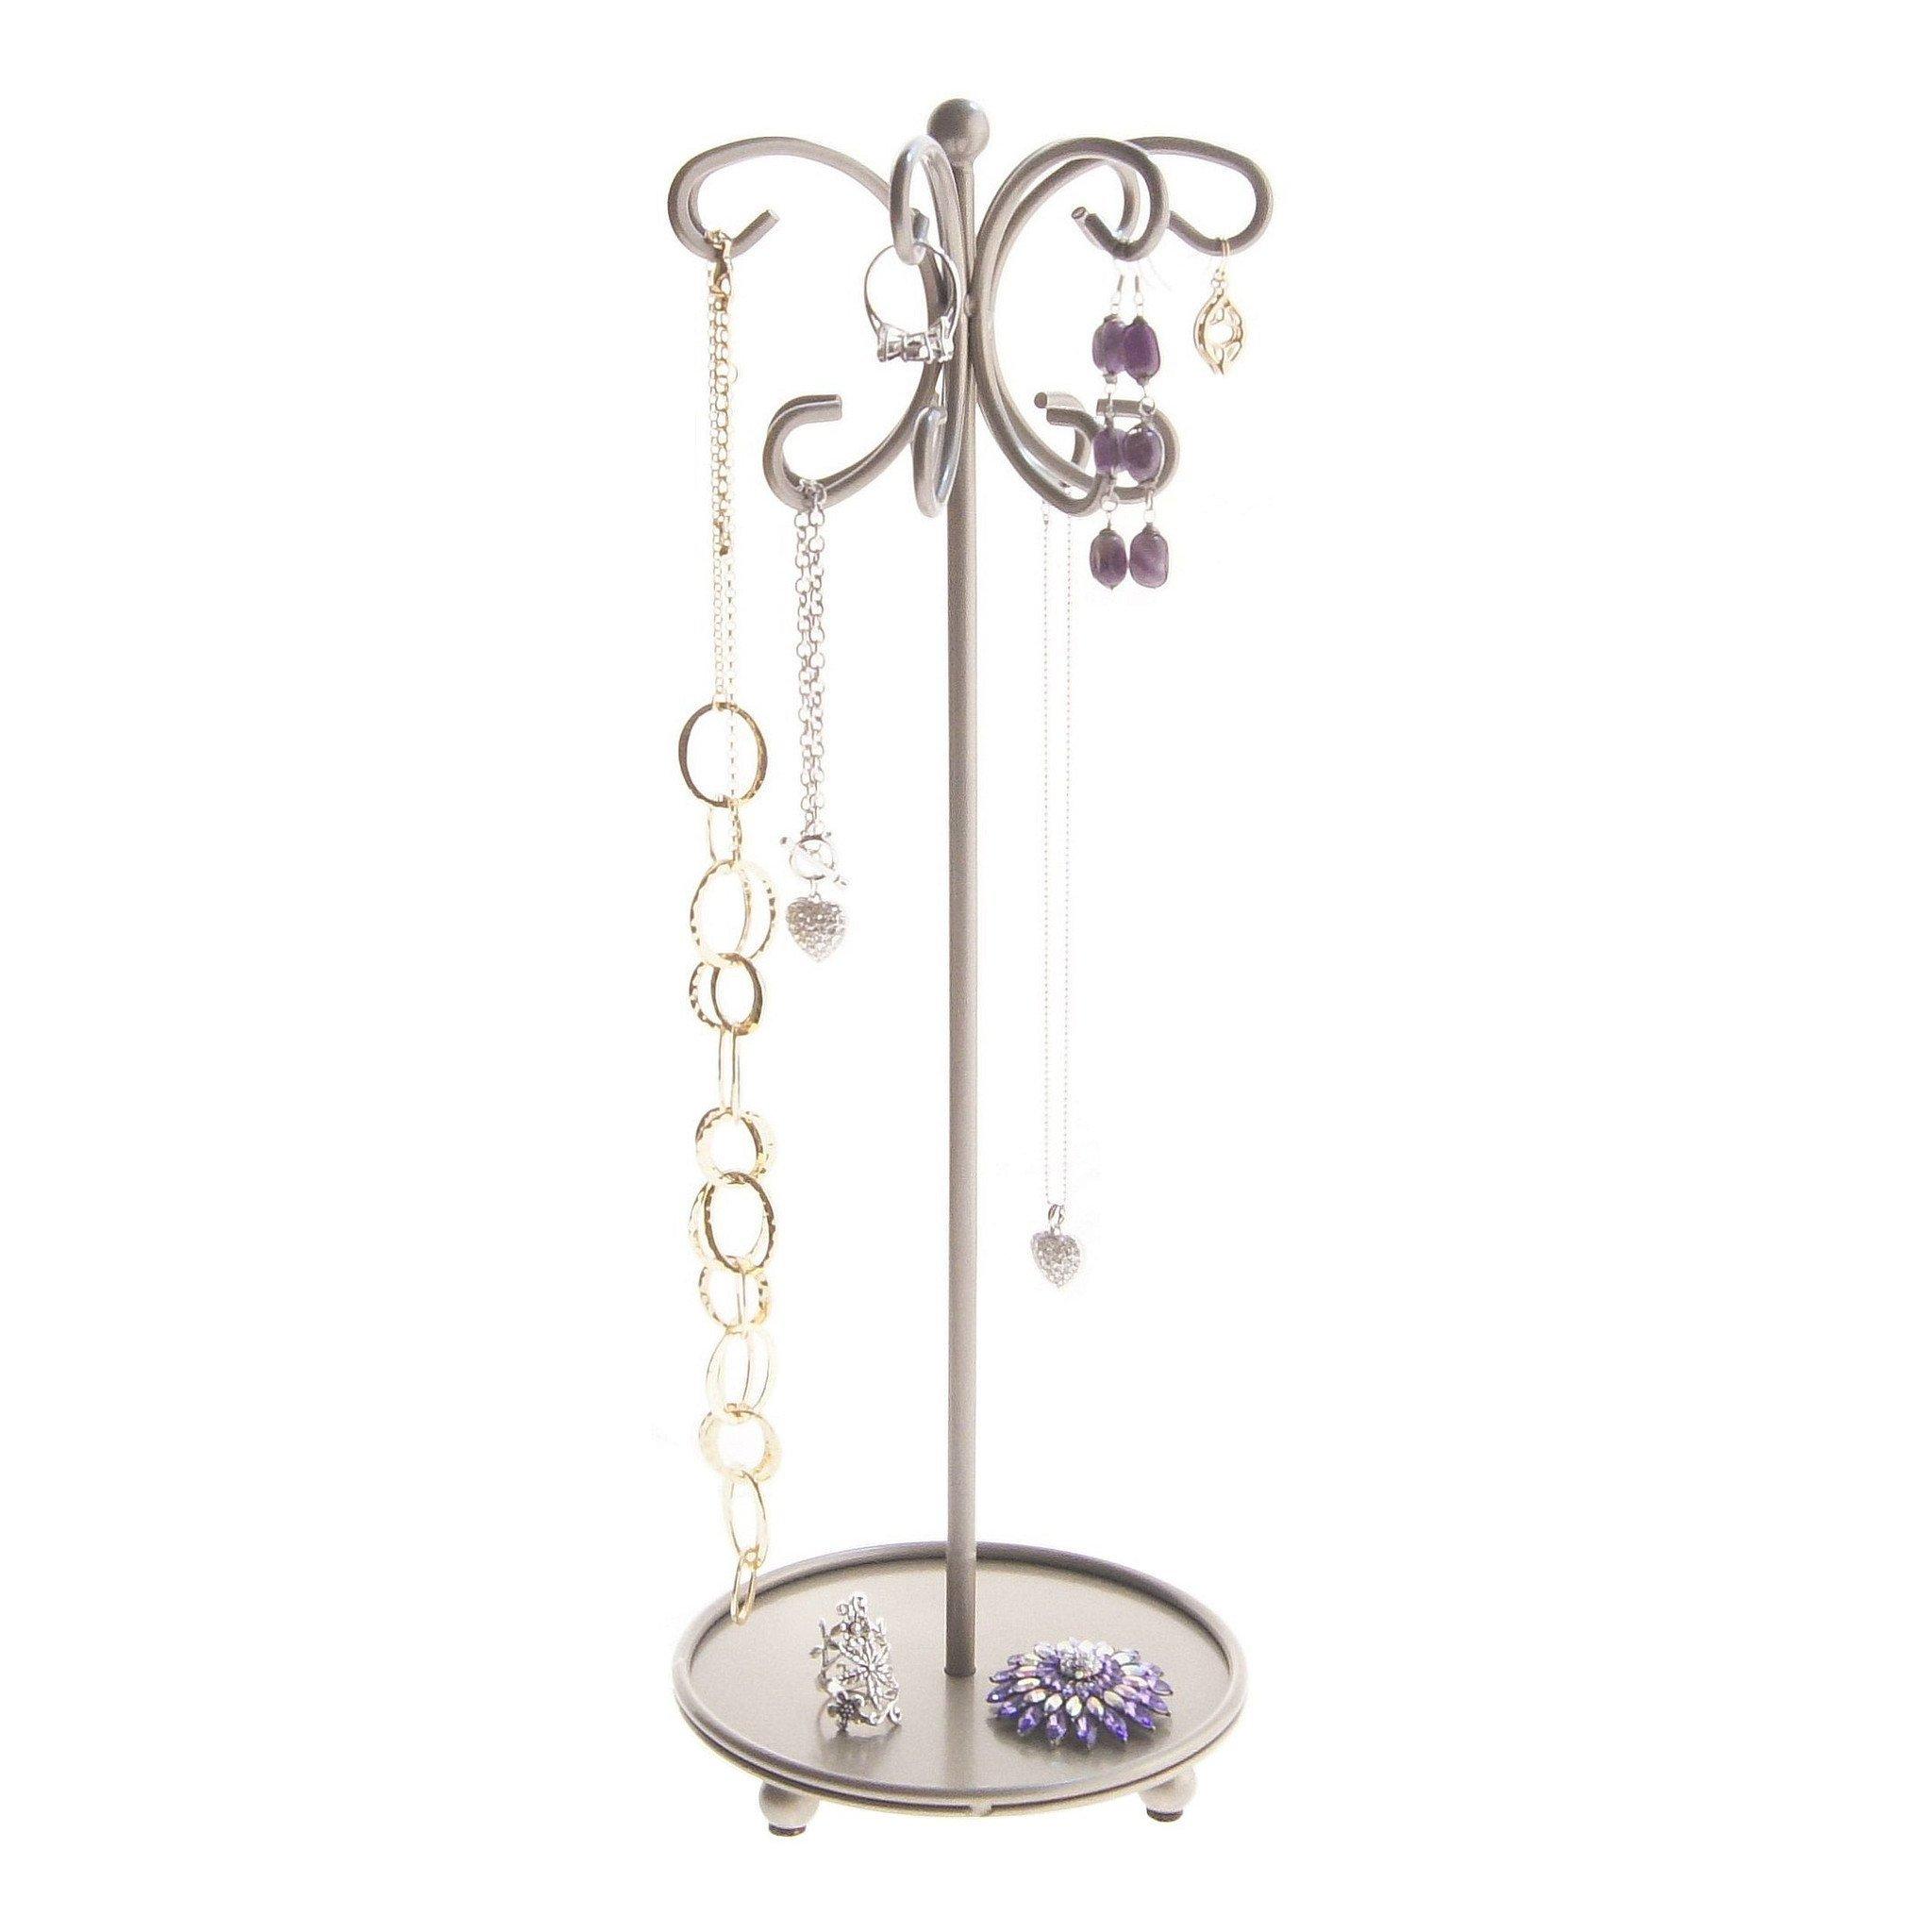 Angelynn's Necklace Holder Organizer Jewelry Tree Stand Storage Rack, Ava Satin Nickel Silver